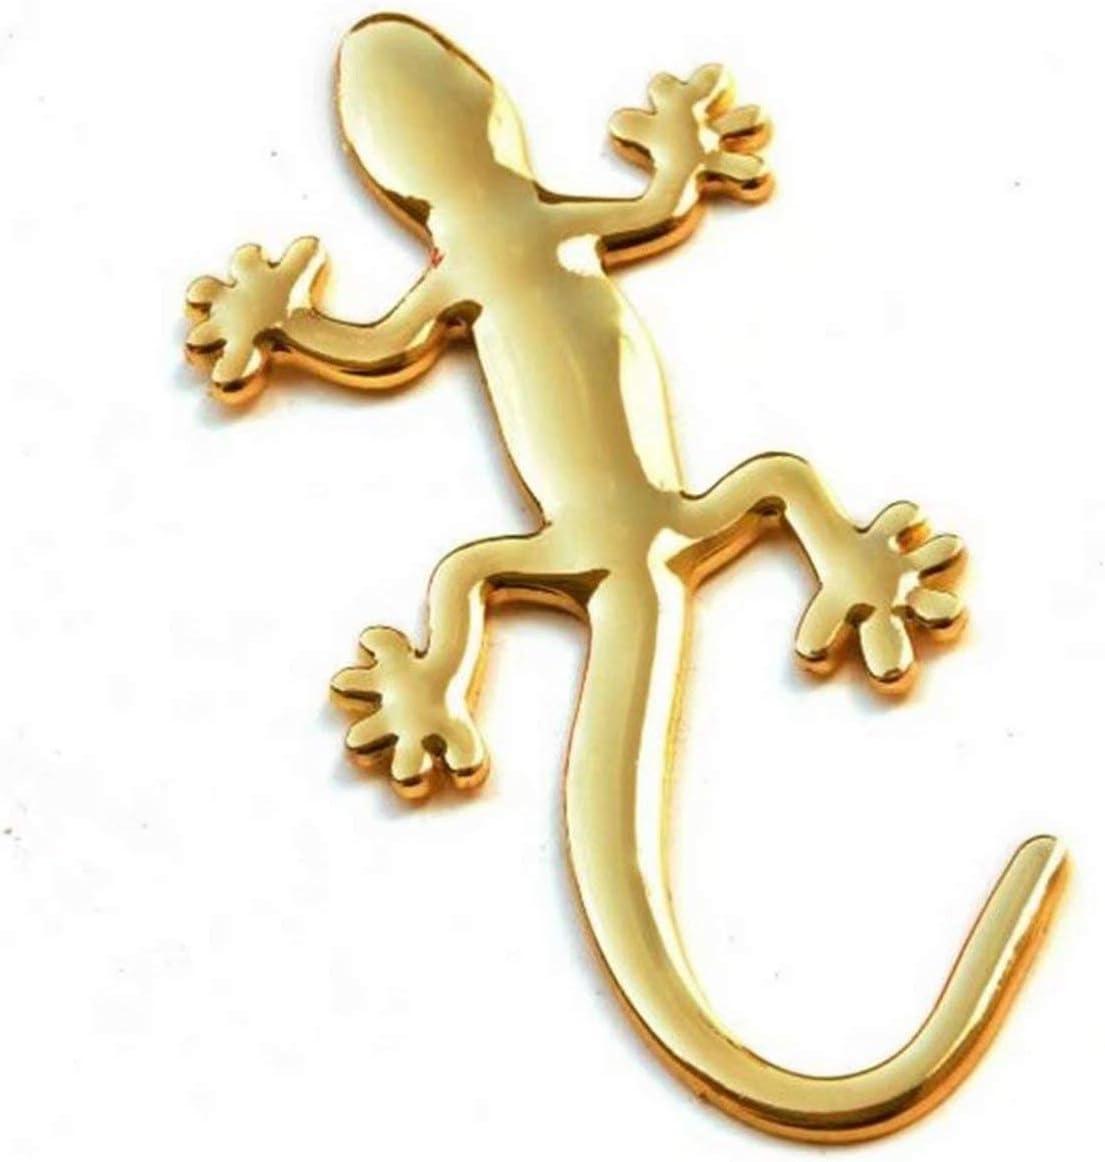 2pcs Car Door Sticker Car Sticker Reflective Strips Decal Body Gecko Decoration